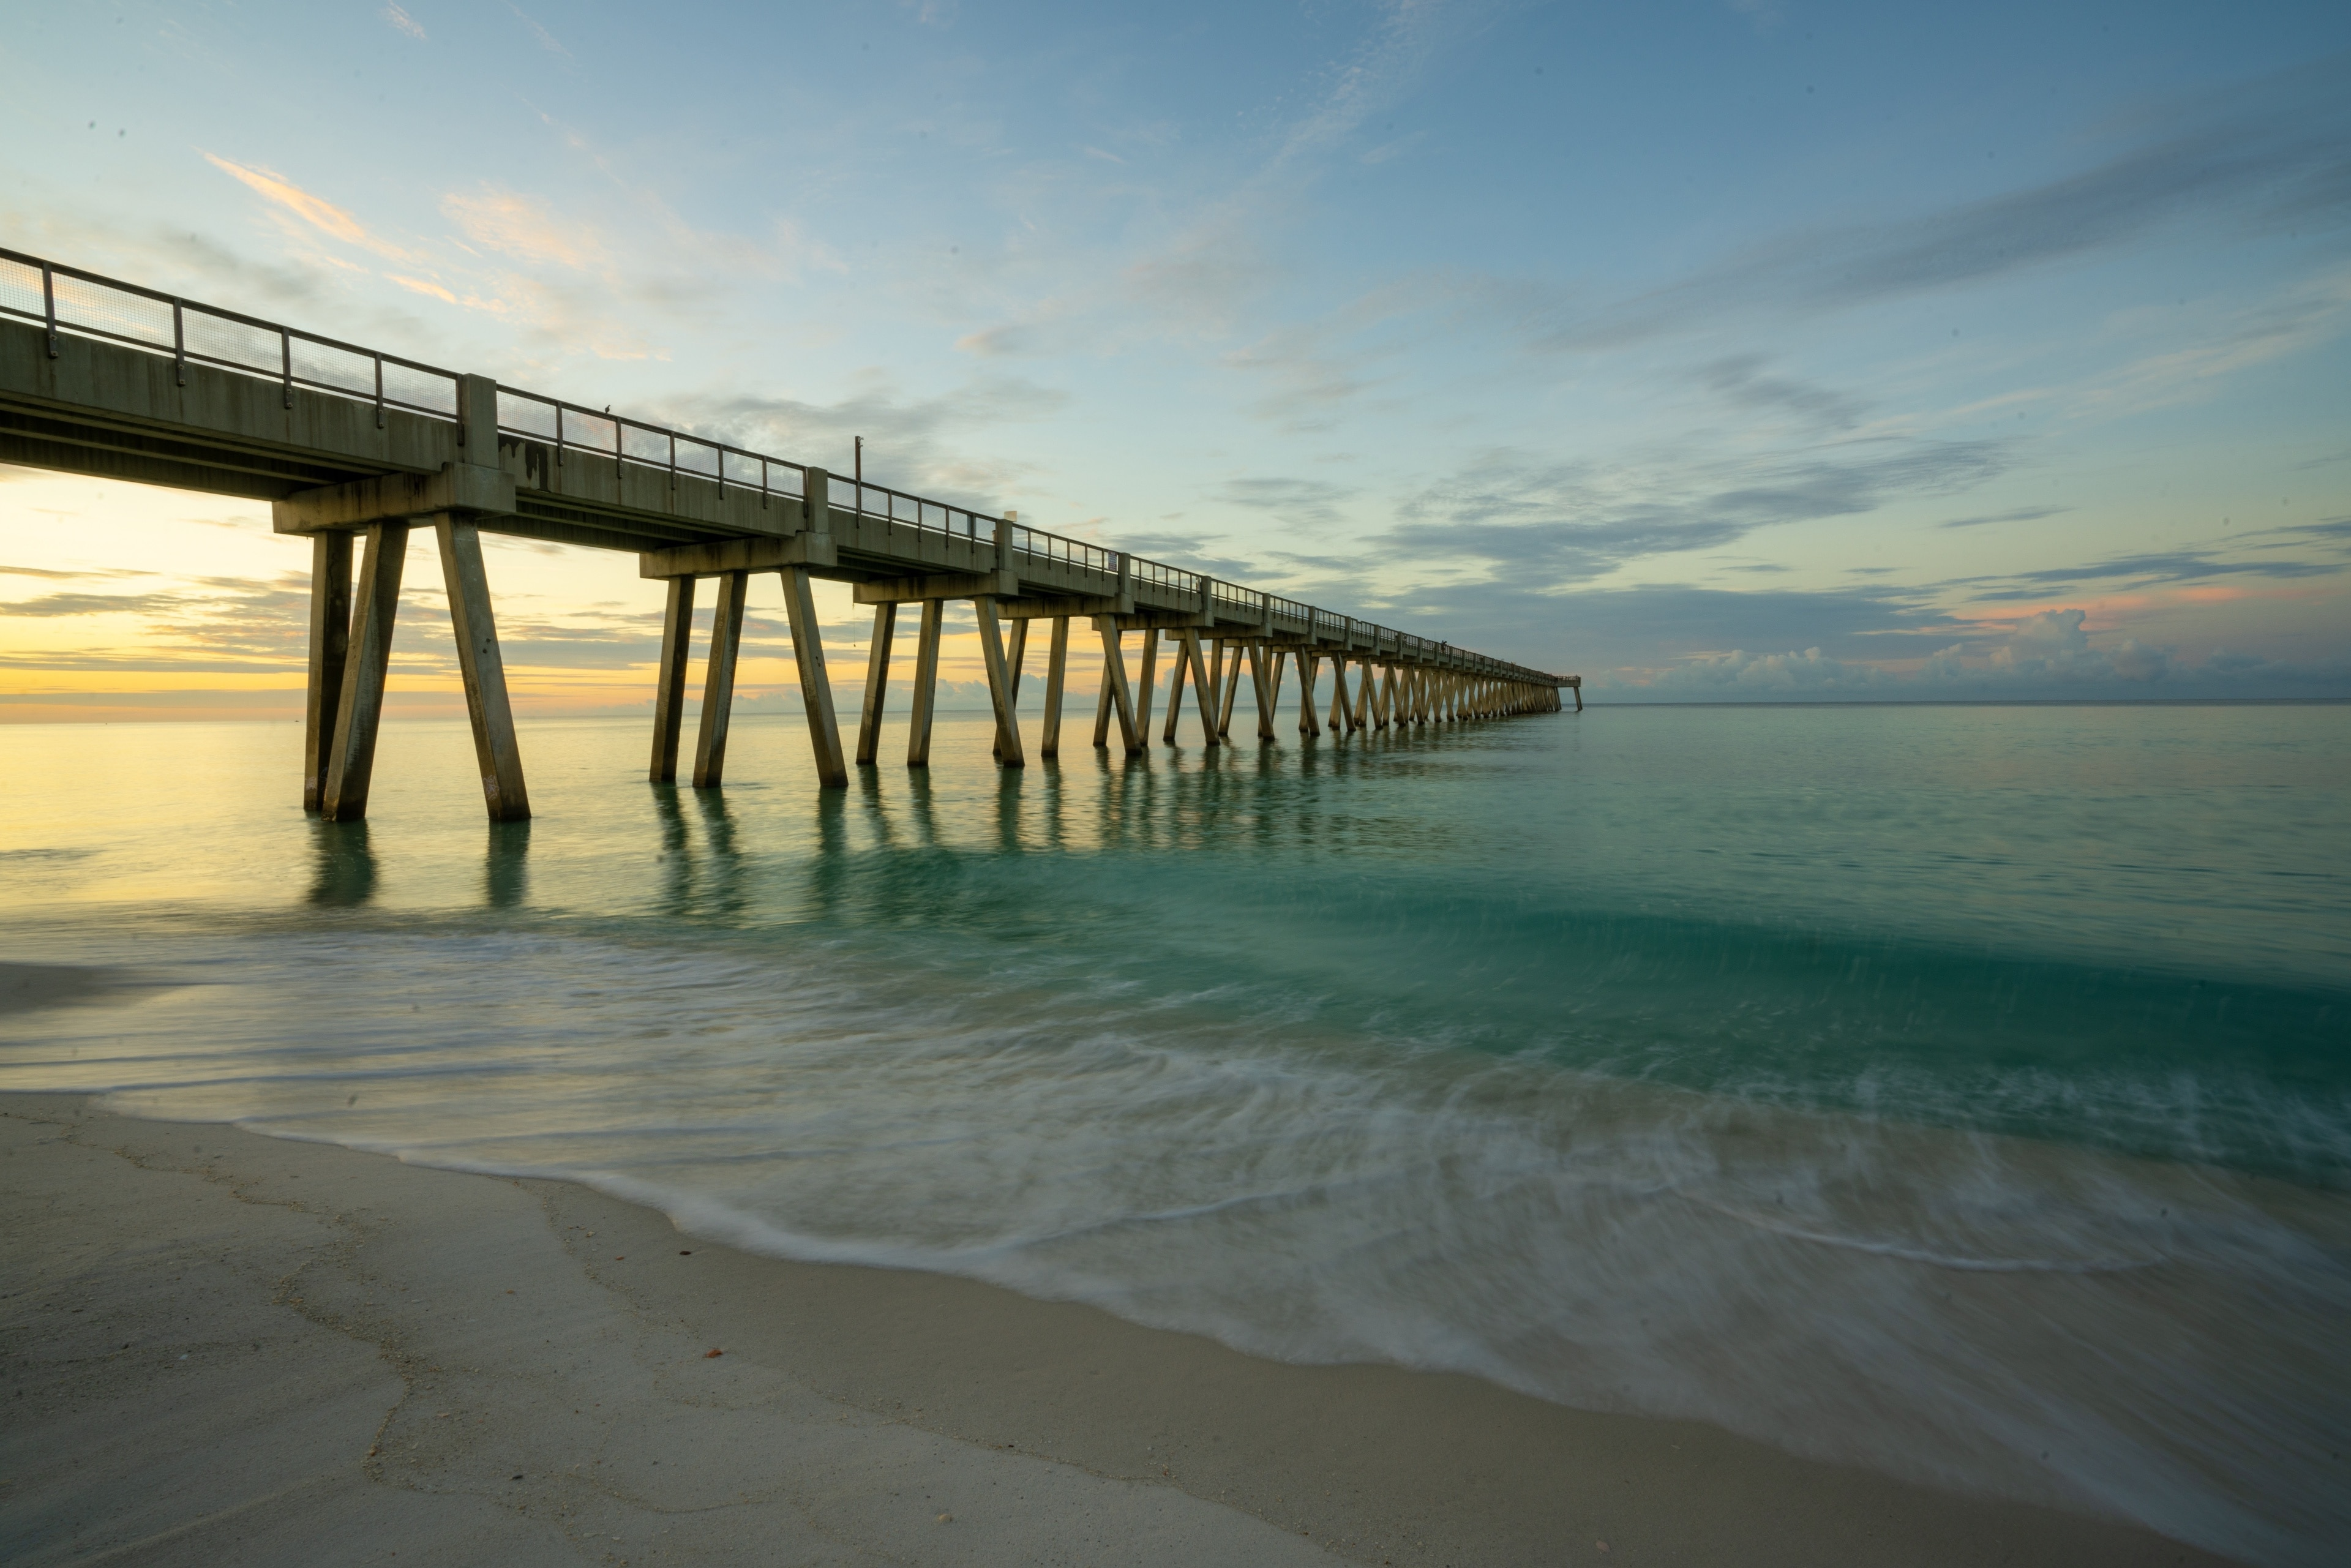 Santa Rosa County, Florida, United States of America